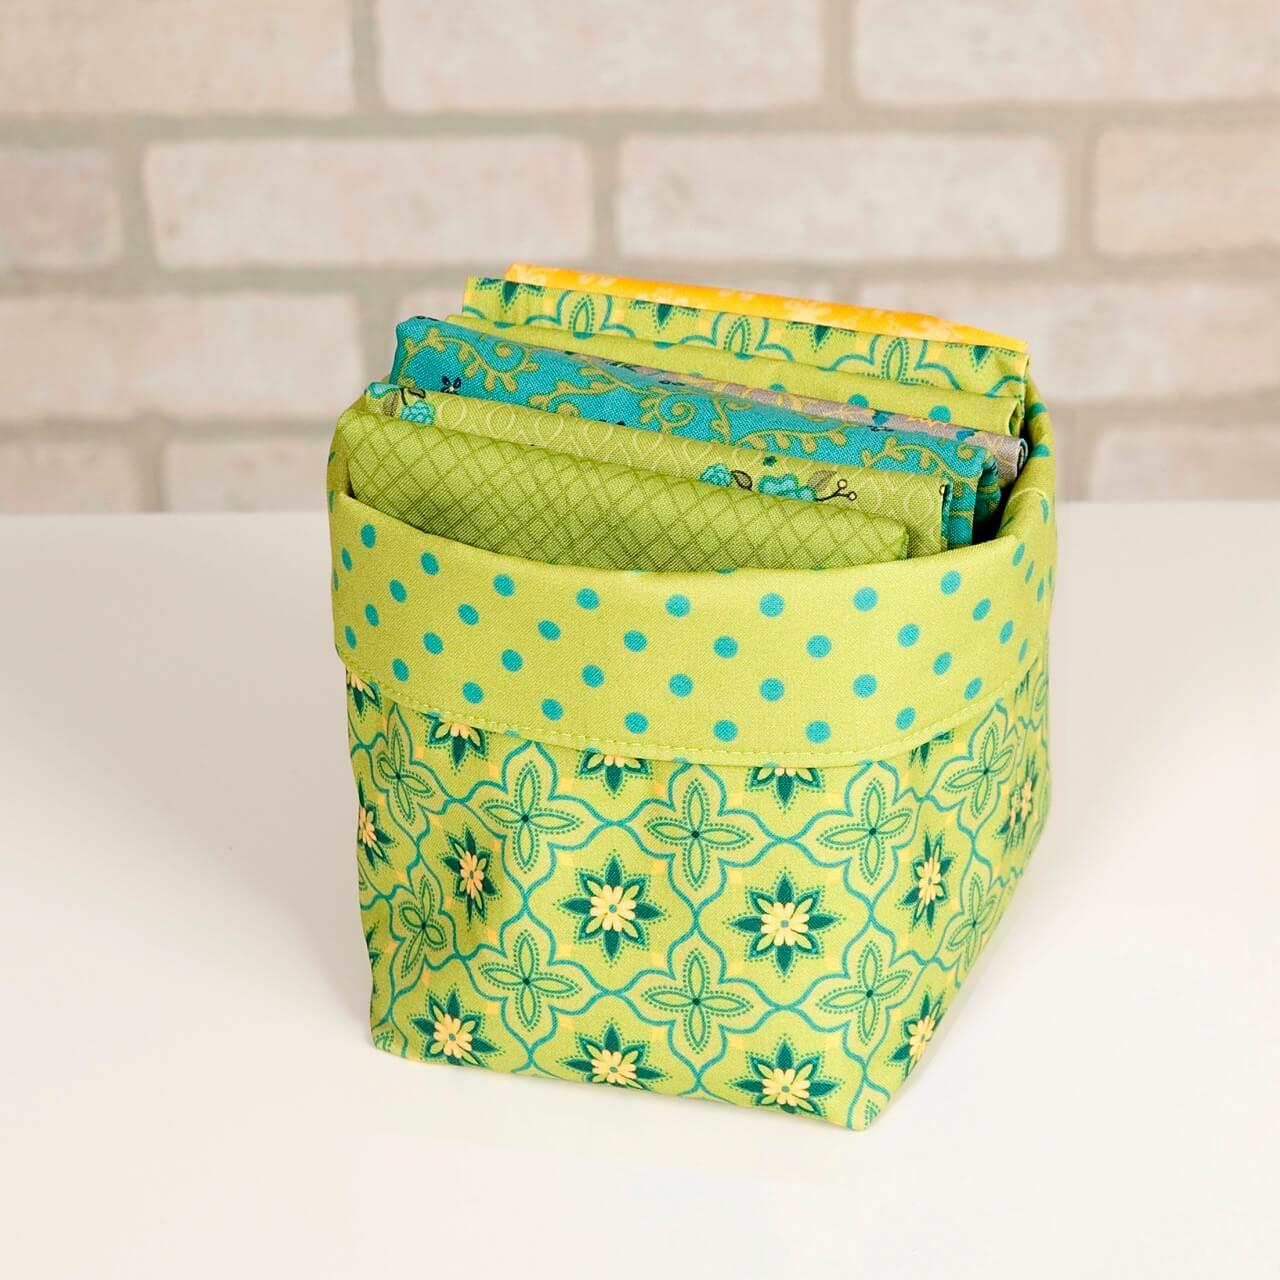 Boutique Fun Fabric Bin Sewing Tutorial at The Nancy Zieman Productions Blog